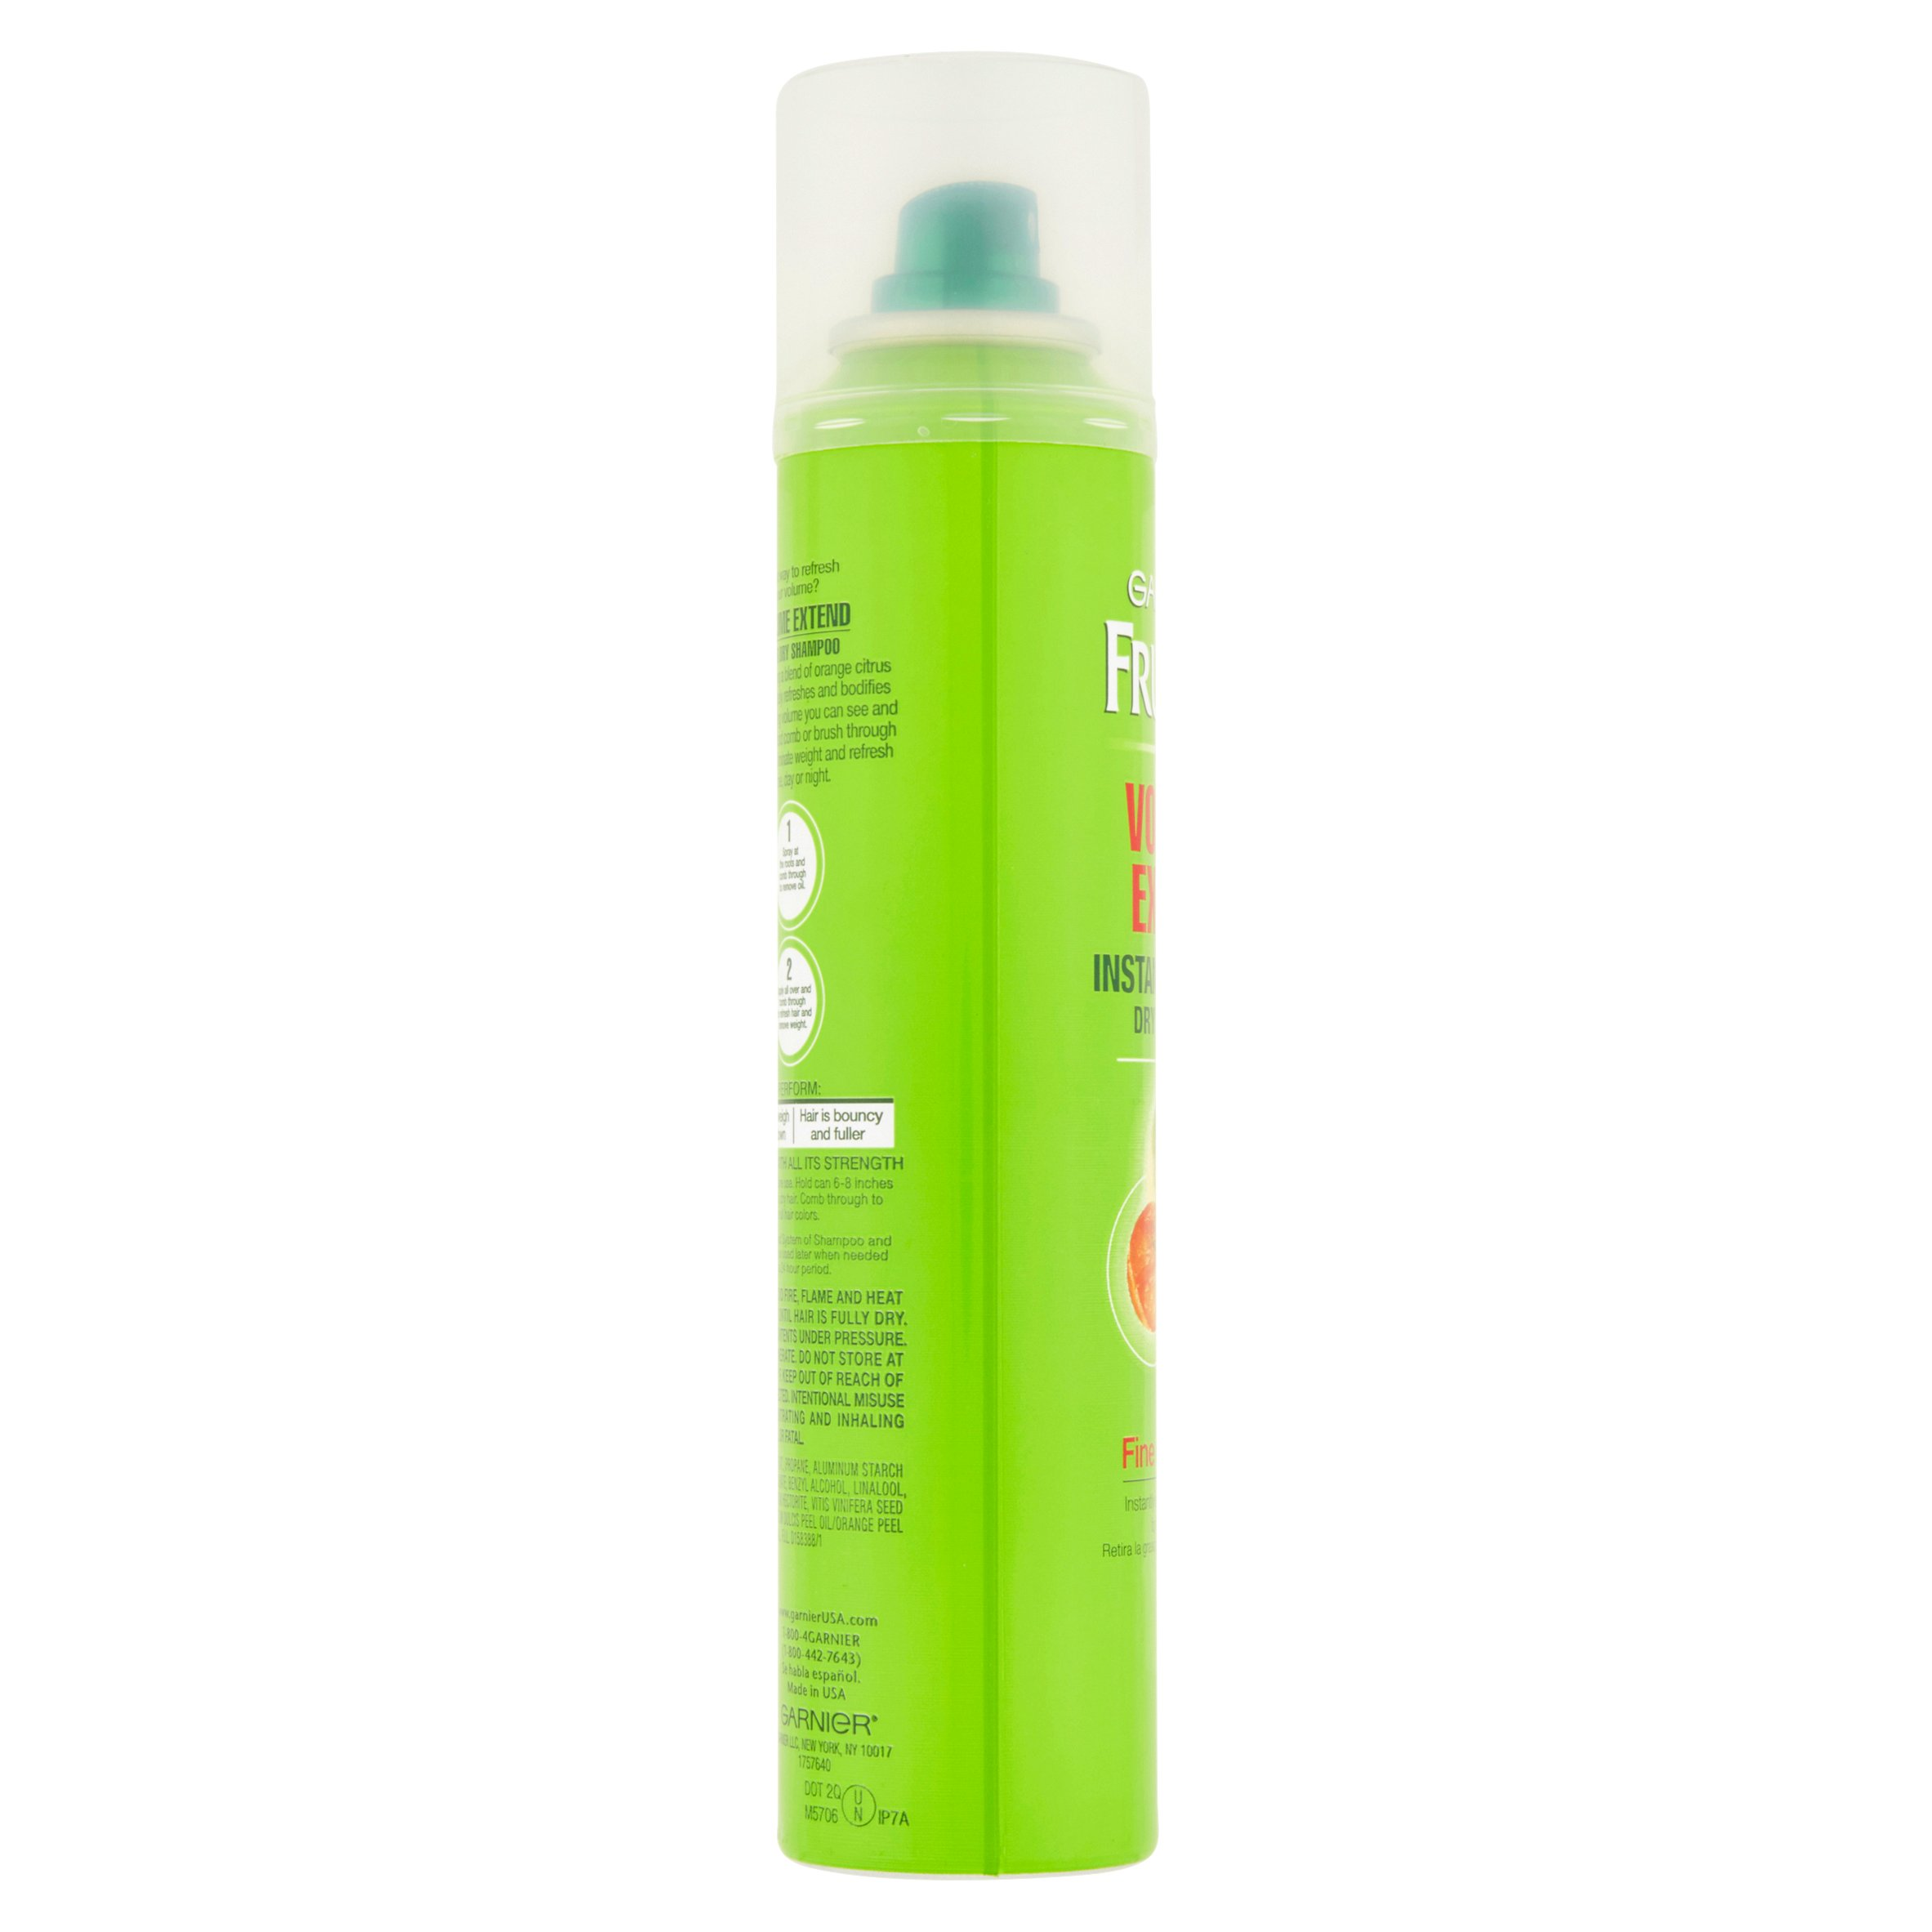 Garnier Fructis Volume Extend Instant Bodifier Dry Shampoo Orange